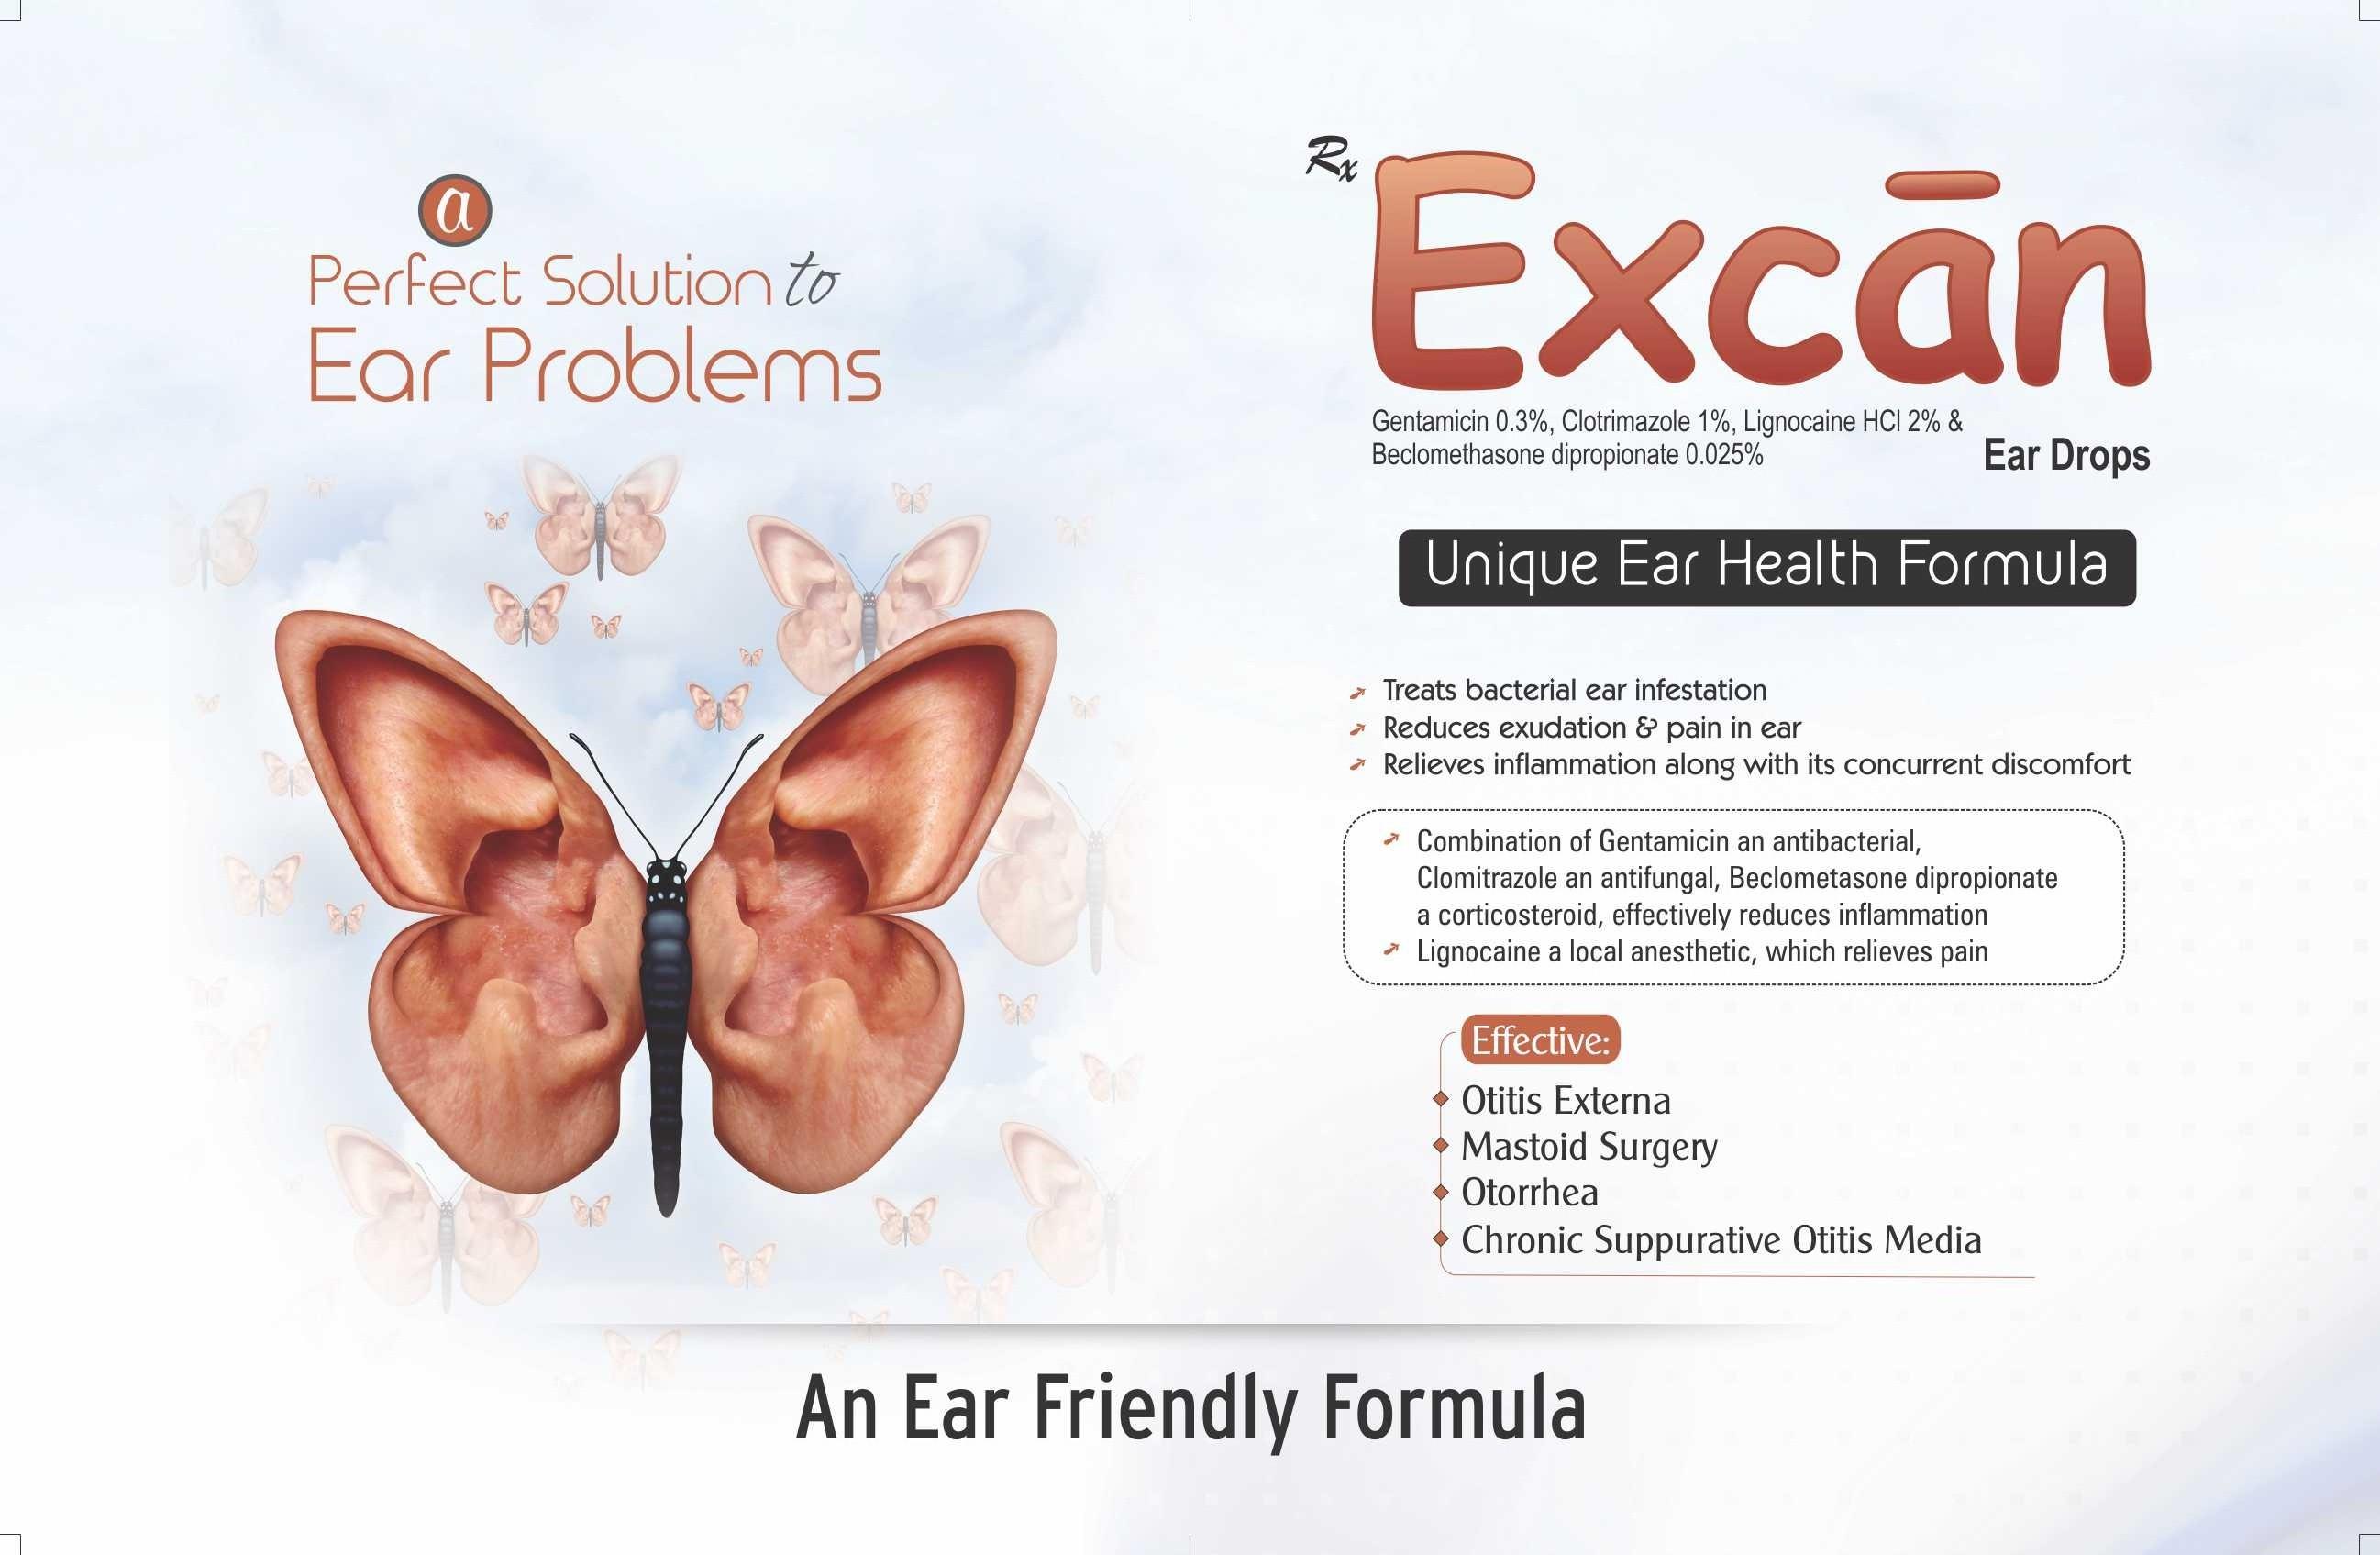 Excan-Ear